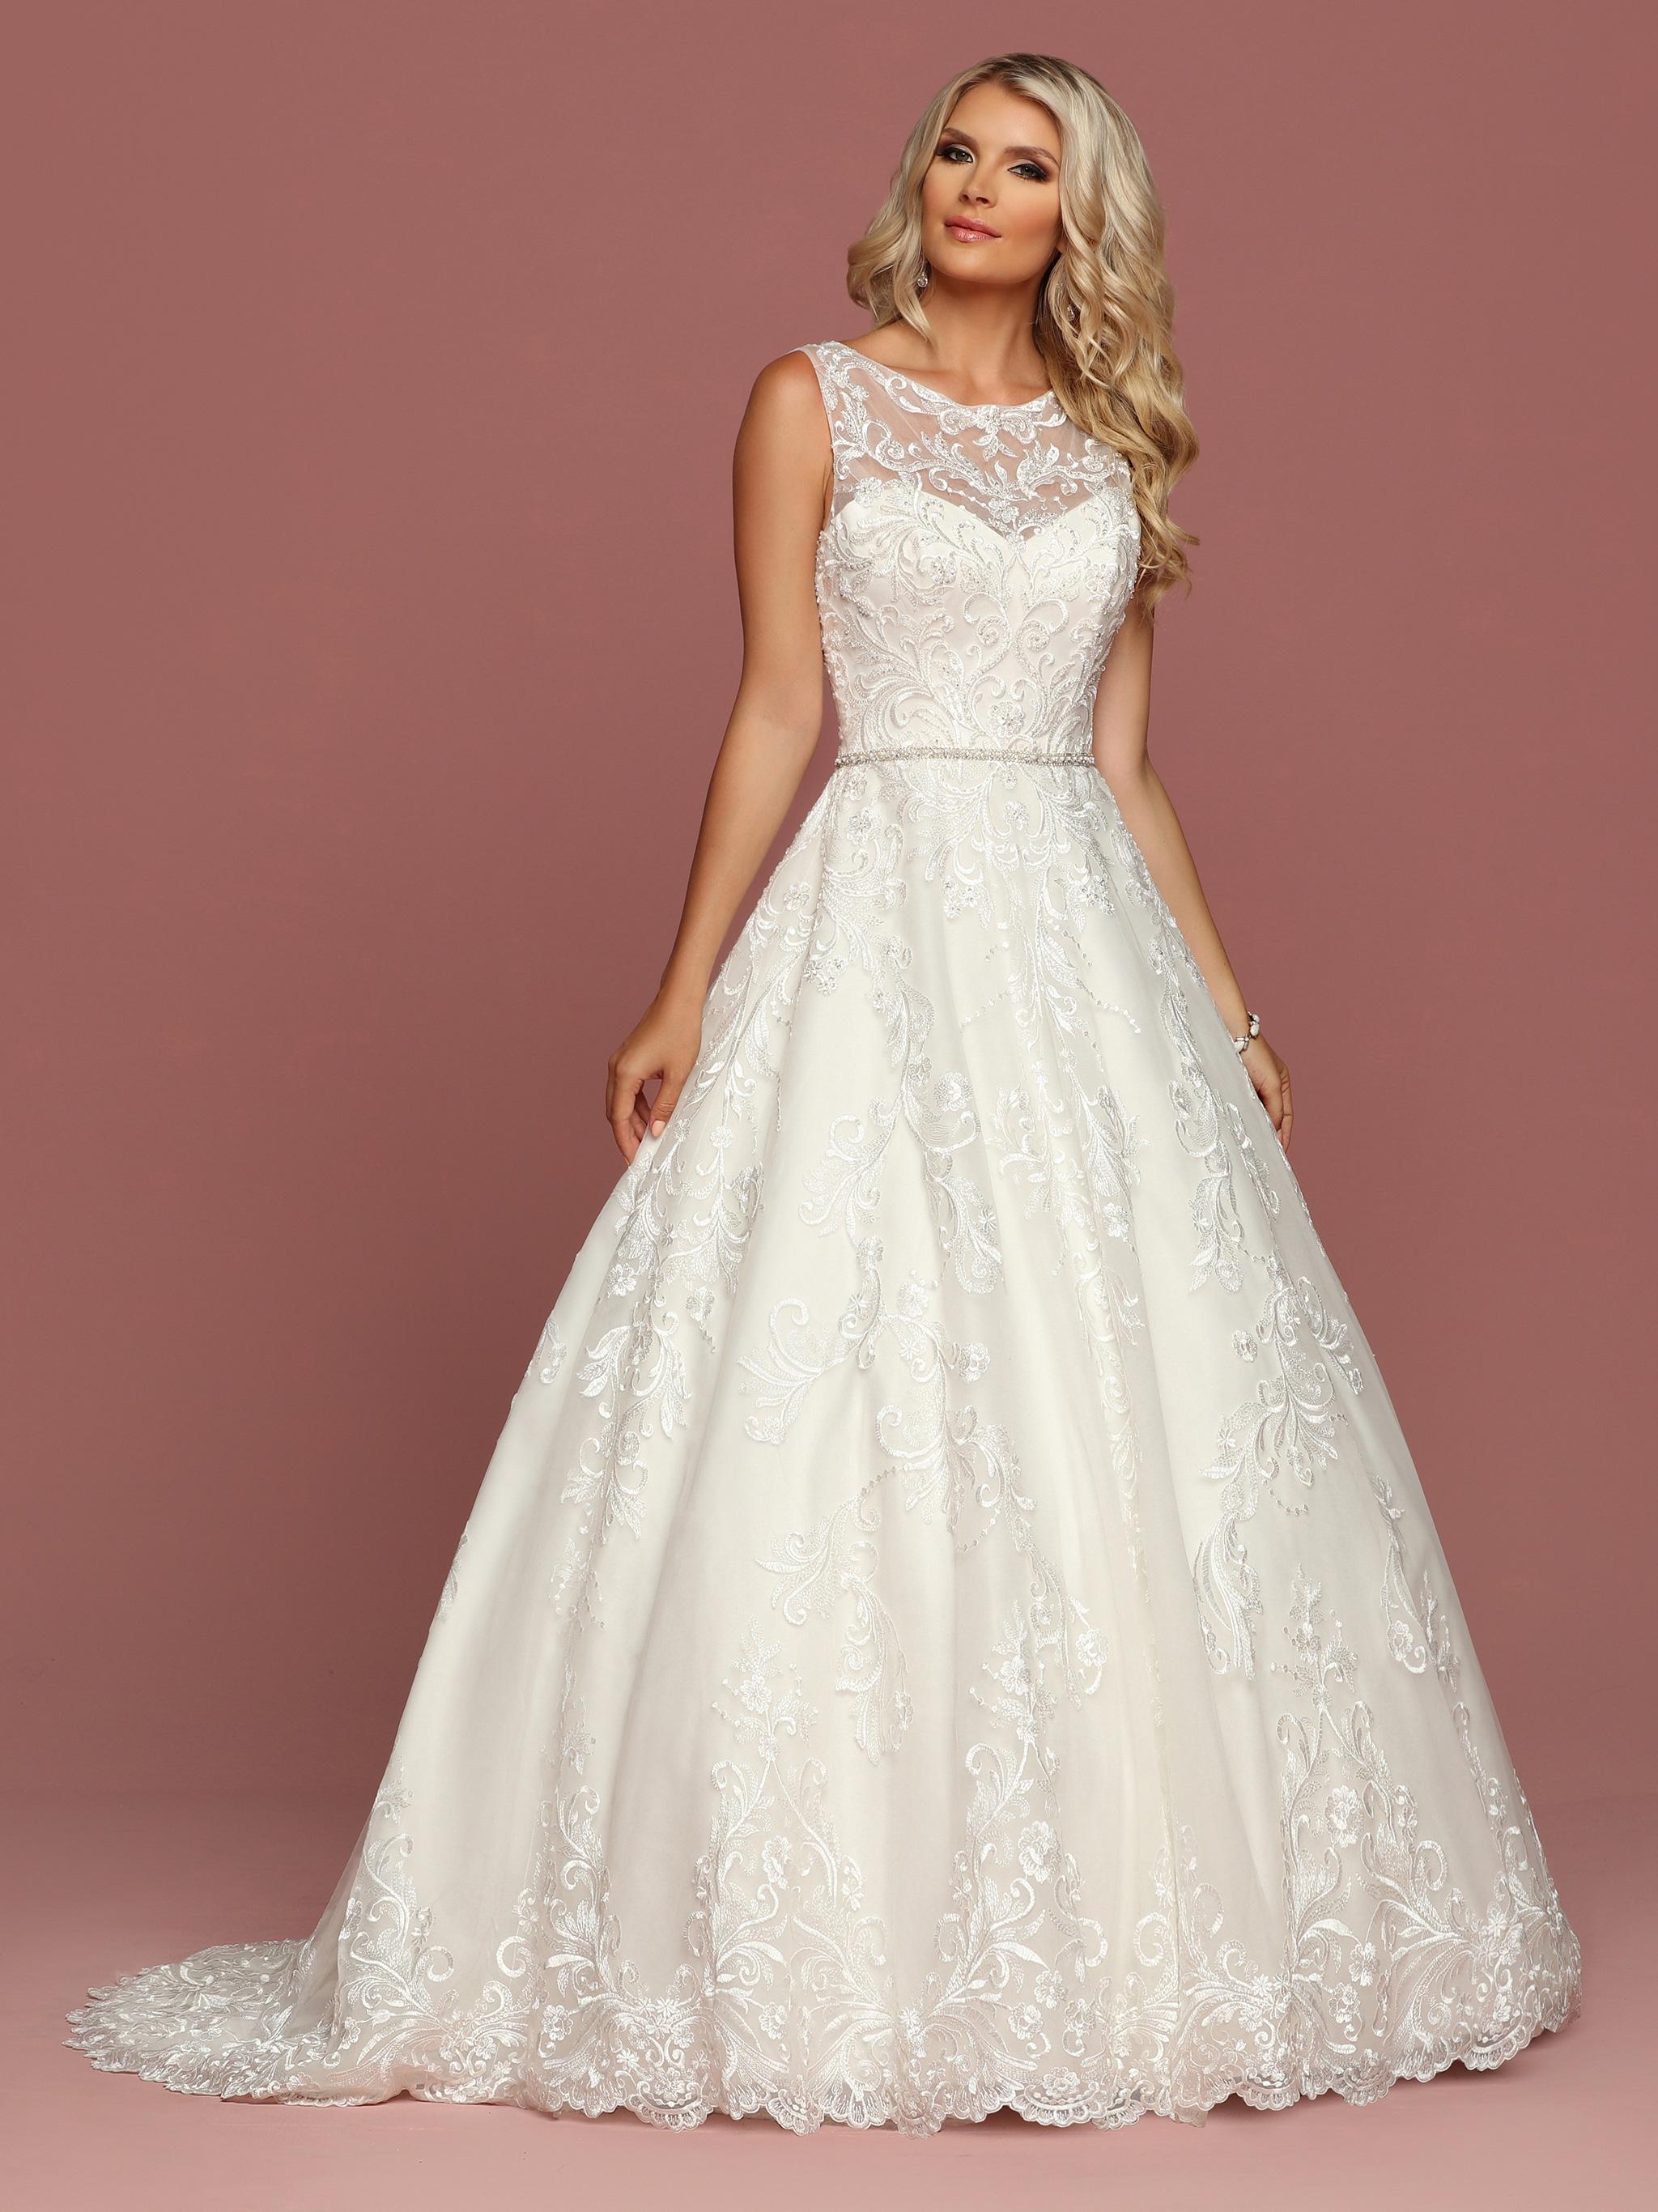 e61dfaf5b1 plus size wedding dresses west midlands - JASMINE BRIDAL